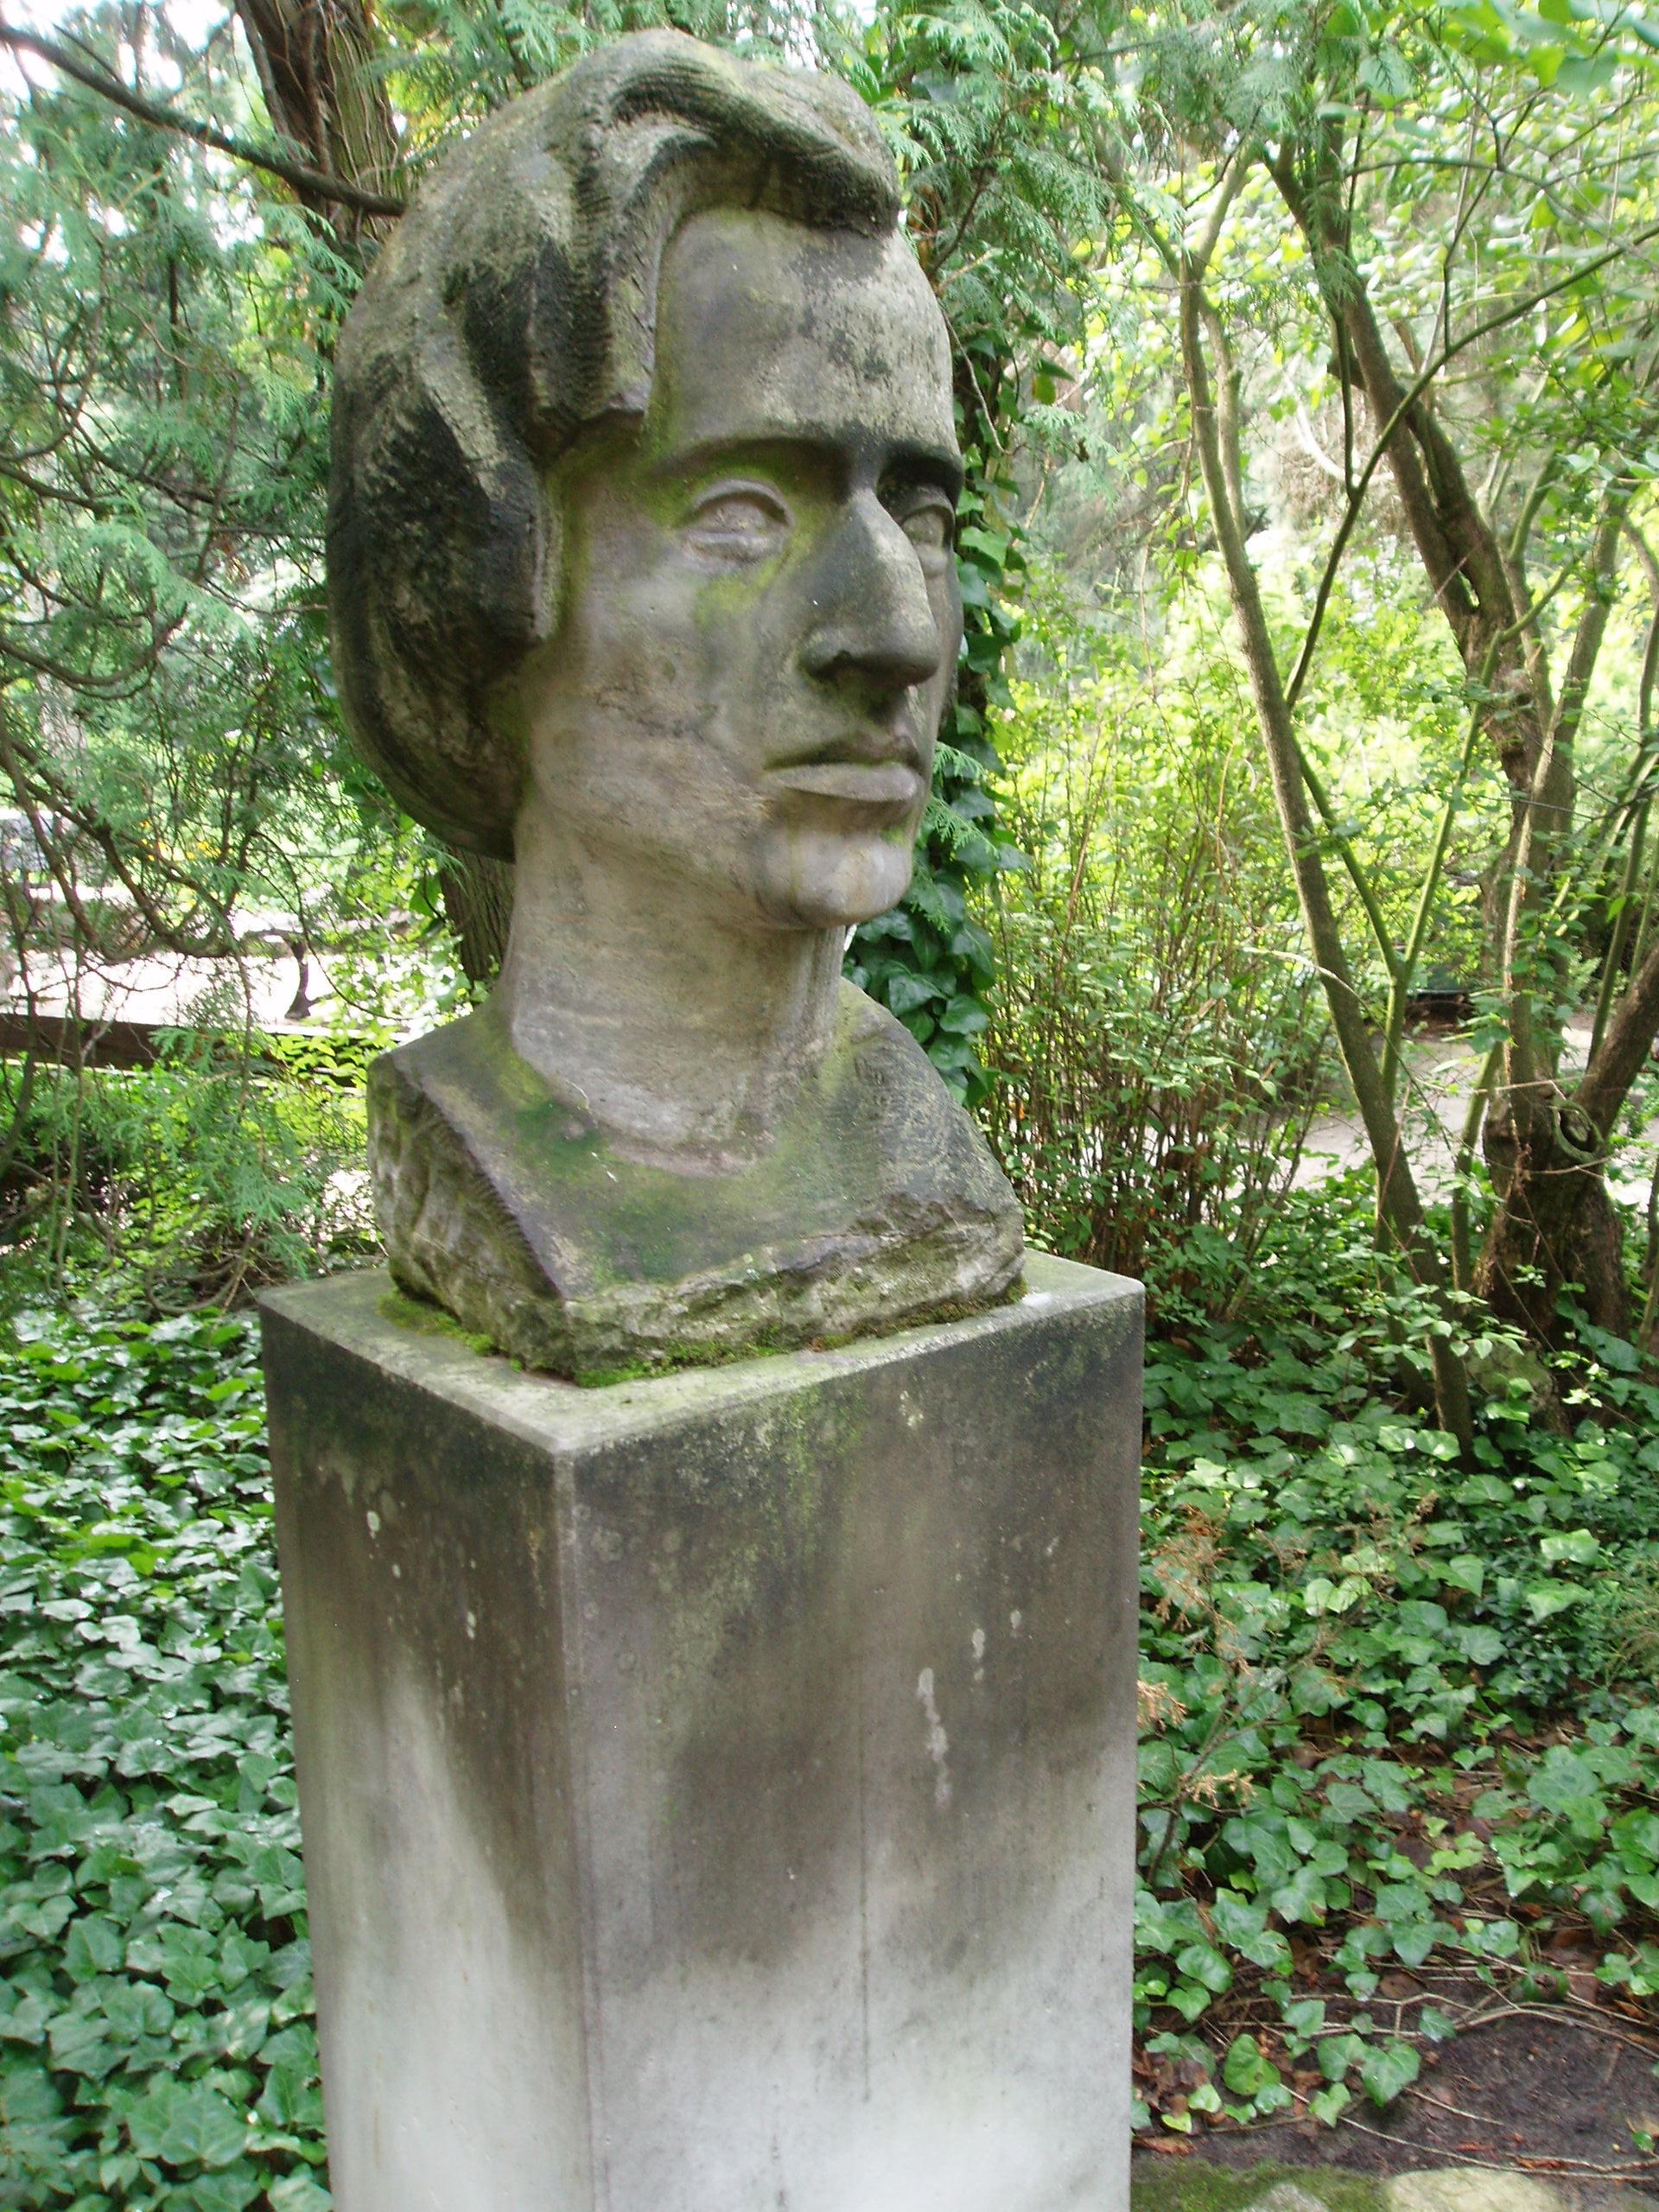 File:Chopin - sculpture in Zelazowa Wola, Poland.jpg - Wikimedia Commons